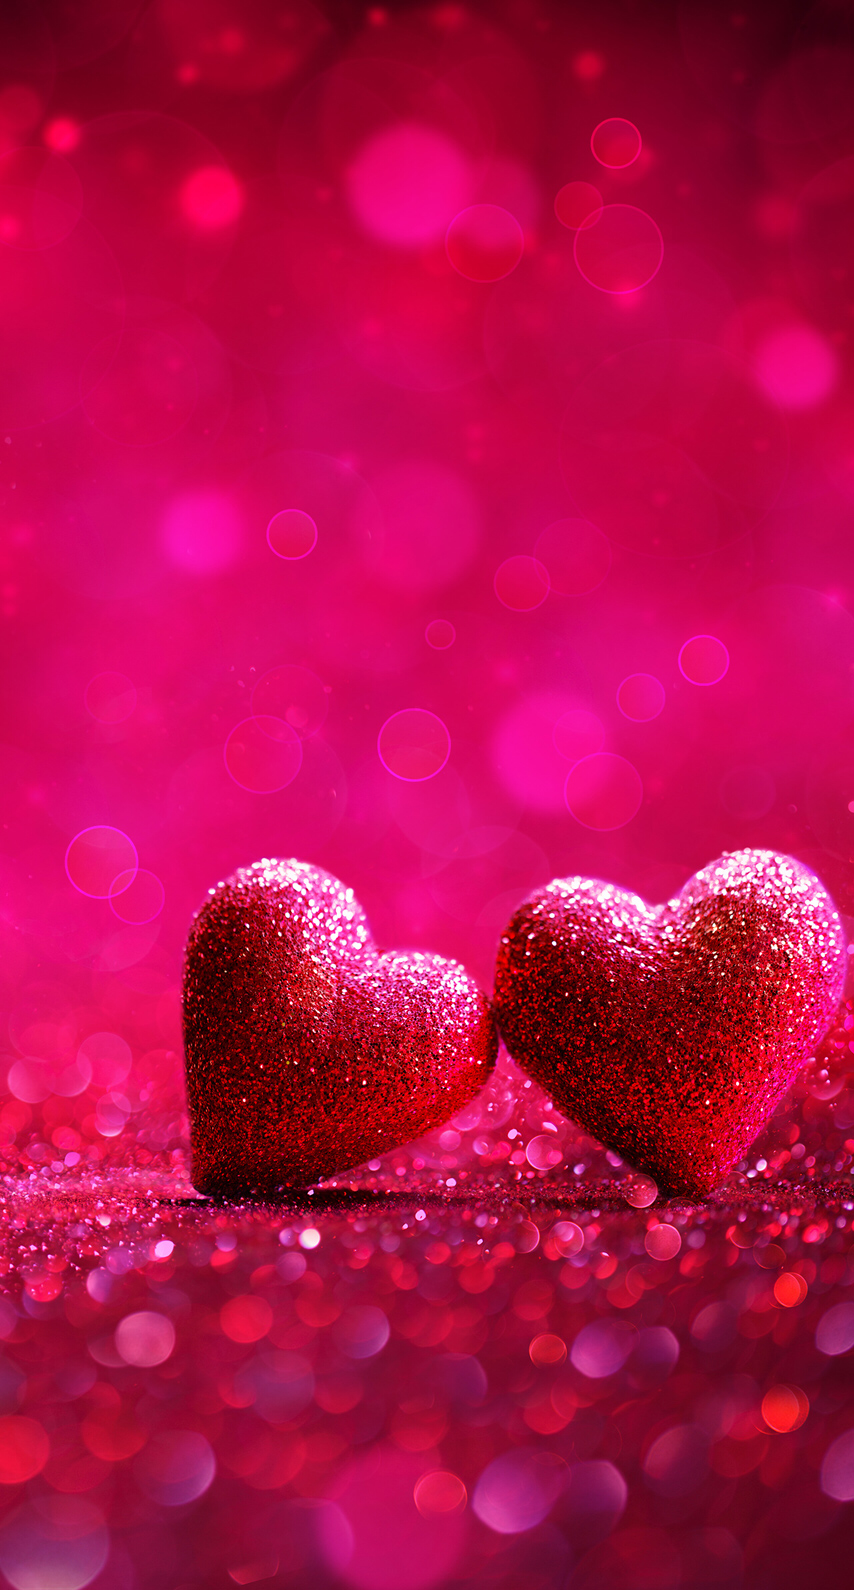 Pretty Pretty Hearts Papel De Parede Celular Papel De Parede De Coracao Papeis De Parede